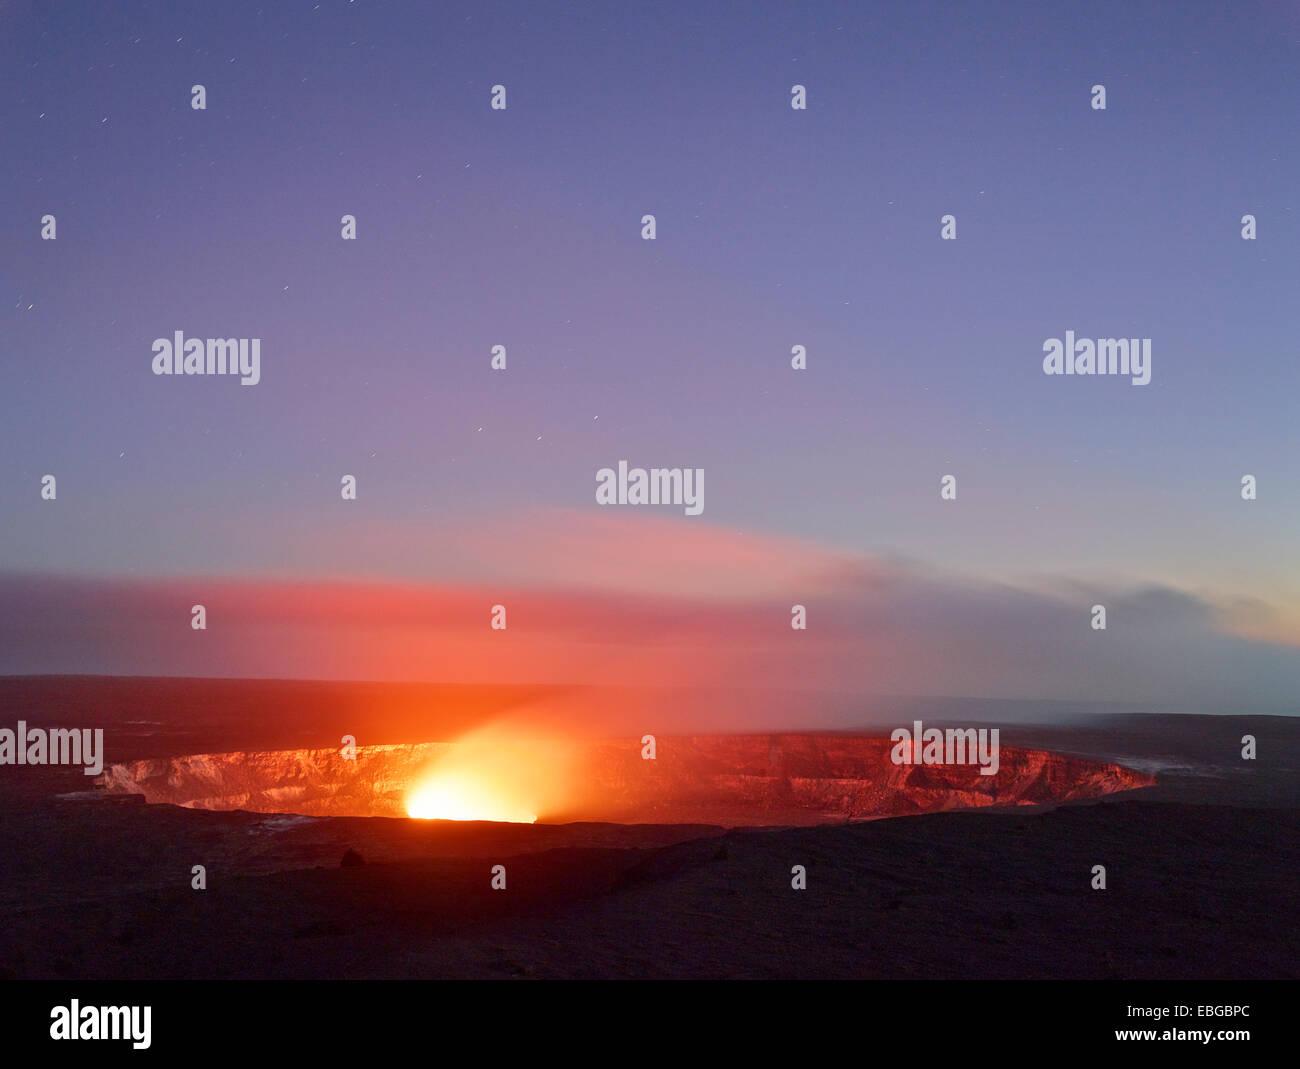 Halema'uma'u or Halemaumau crater, Kilauea crater, volcanic eruption, lava, red hot lava flow, in the evening - Stock Image